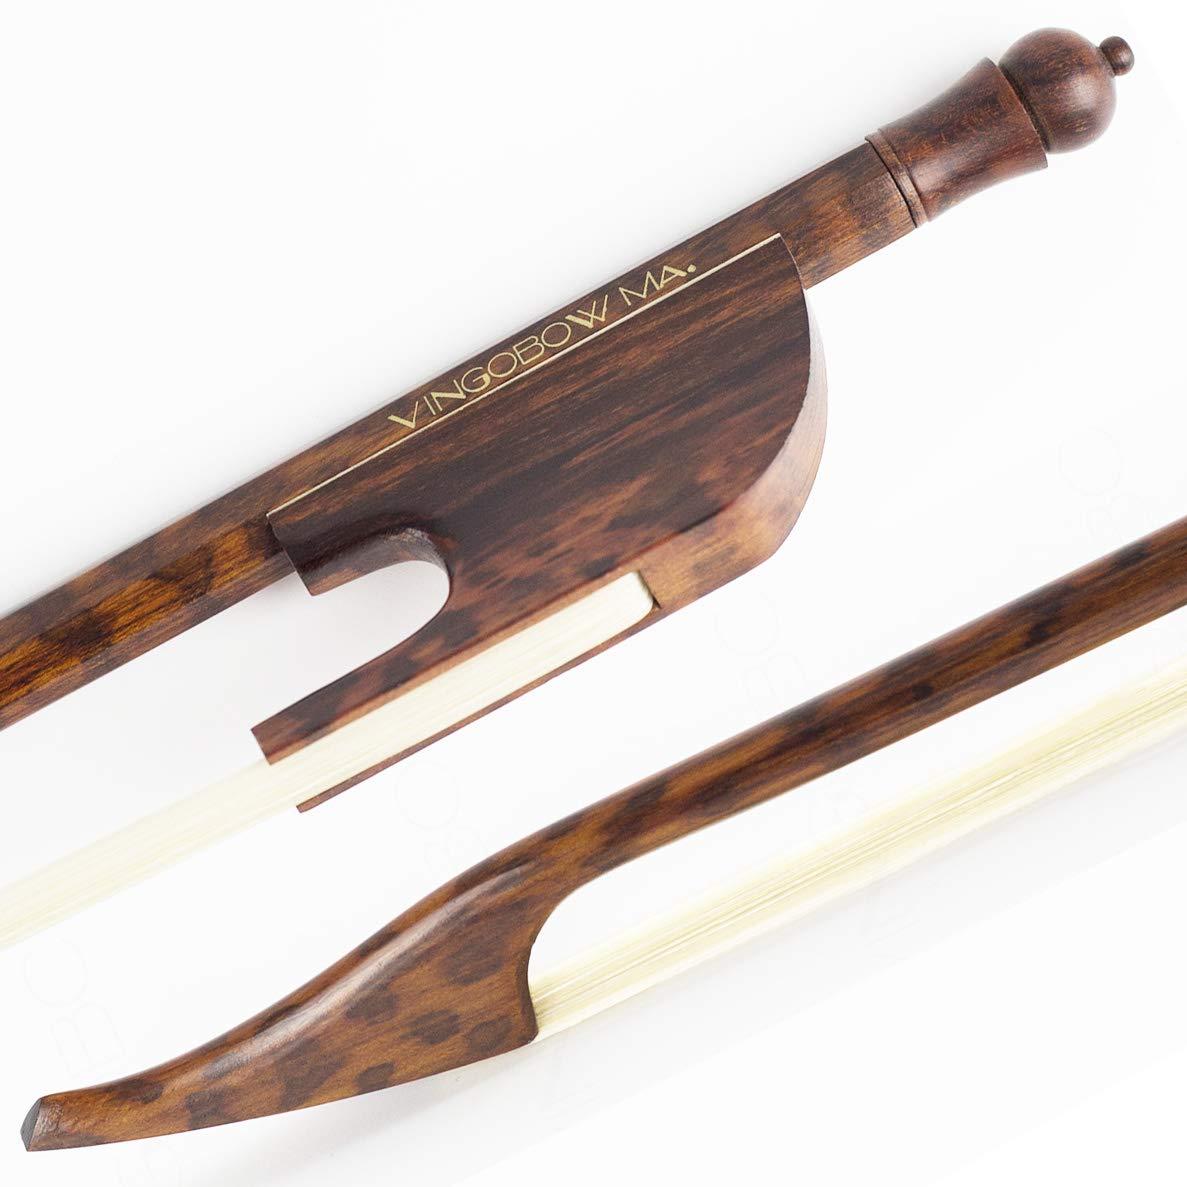 VINGOBOW 4/4 Size Snake Wood Baroque VIOLIN BOW, Warm Tone and Well Balanced, Art No. 610V